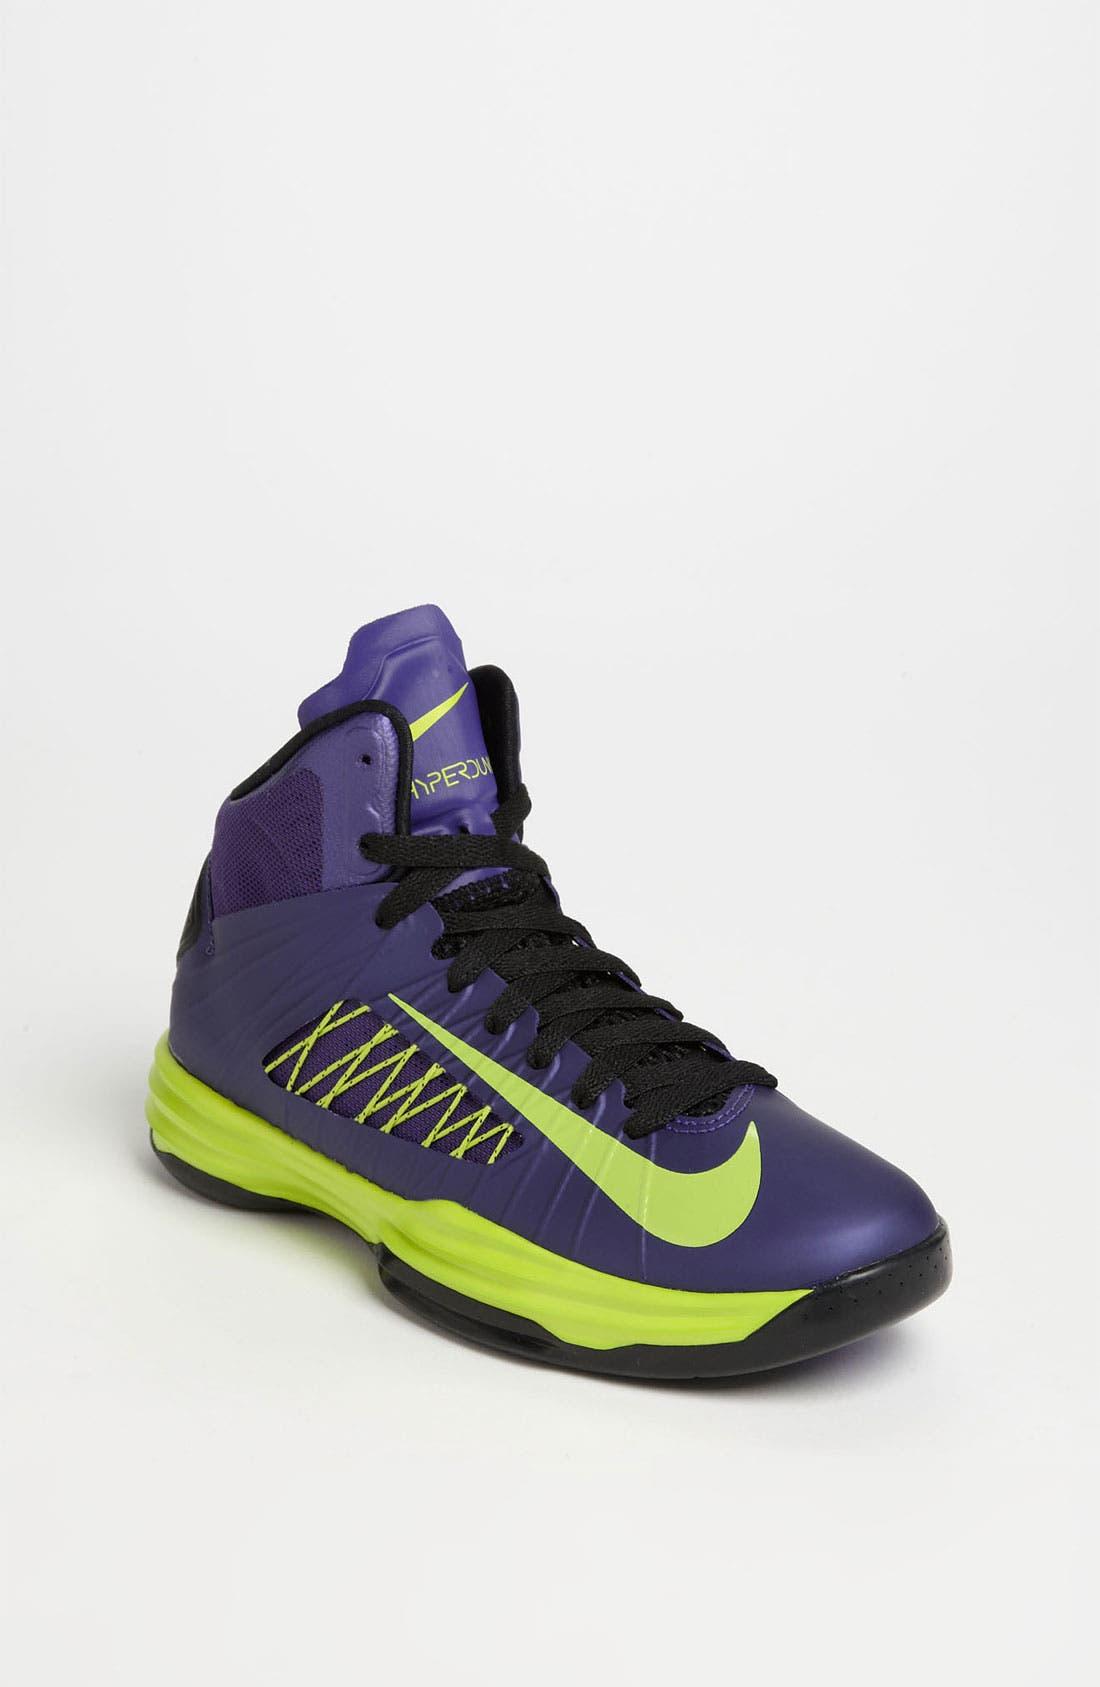 Alternate Image 1 Selected - Nike 'Lunar Hyperdunk' Basketball Shoe (Big Kid)